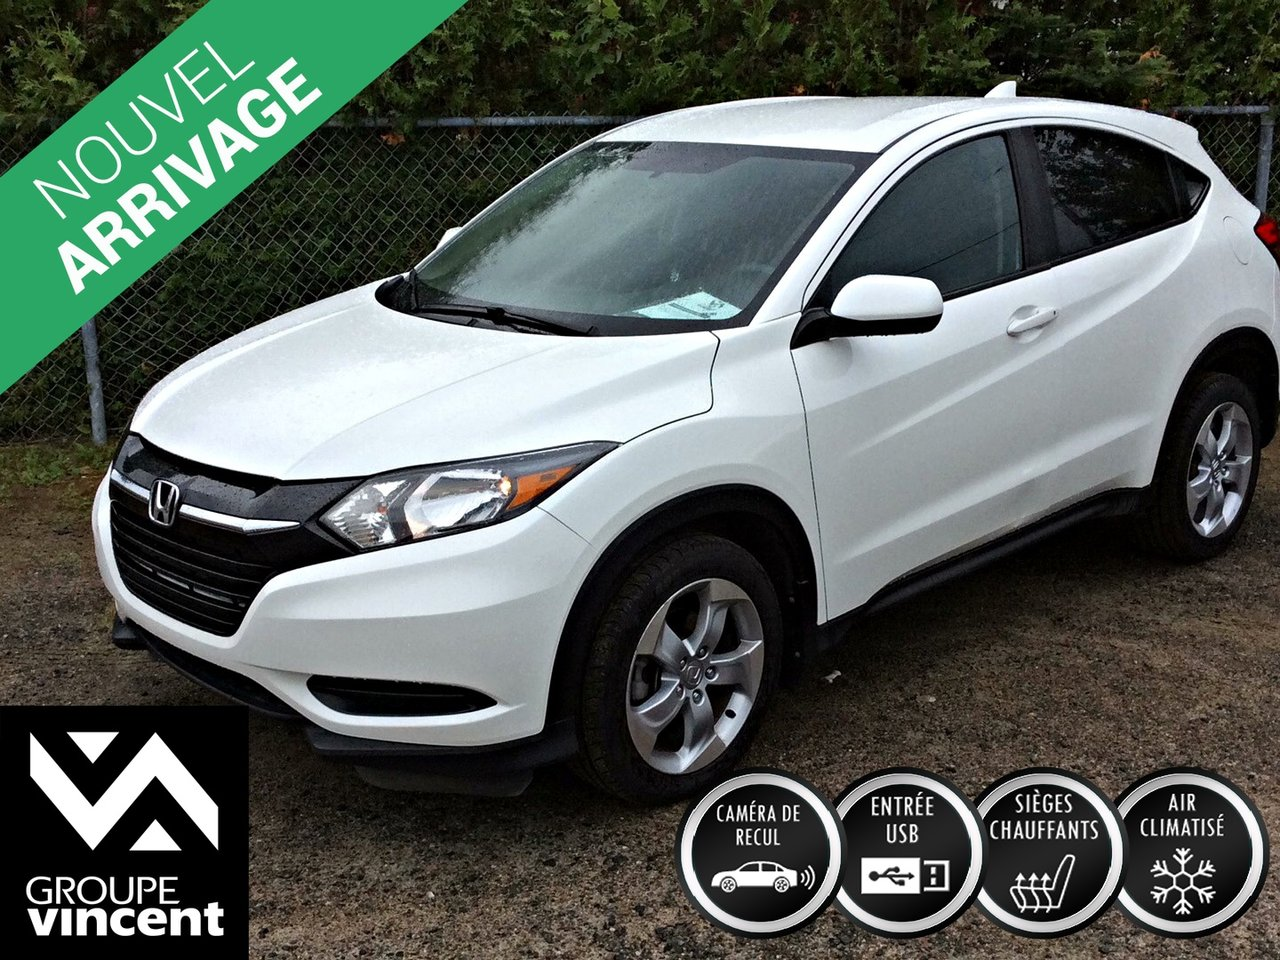 2016 Honda  HR-V LX AWD **GARANTIE 10 ANS**